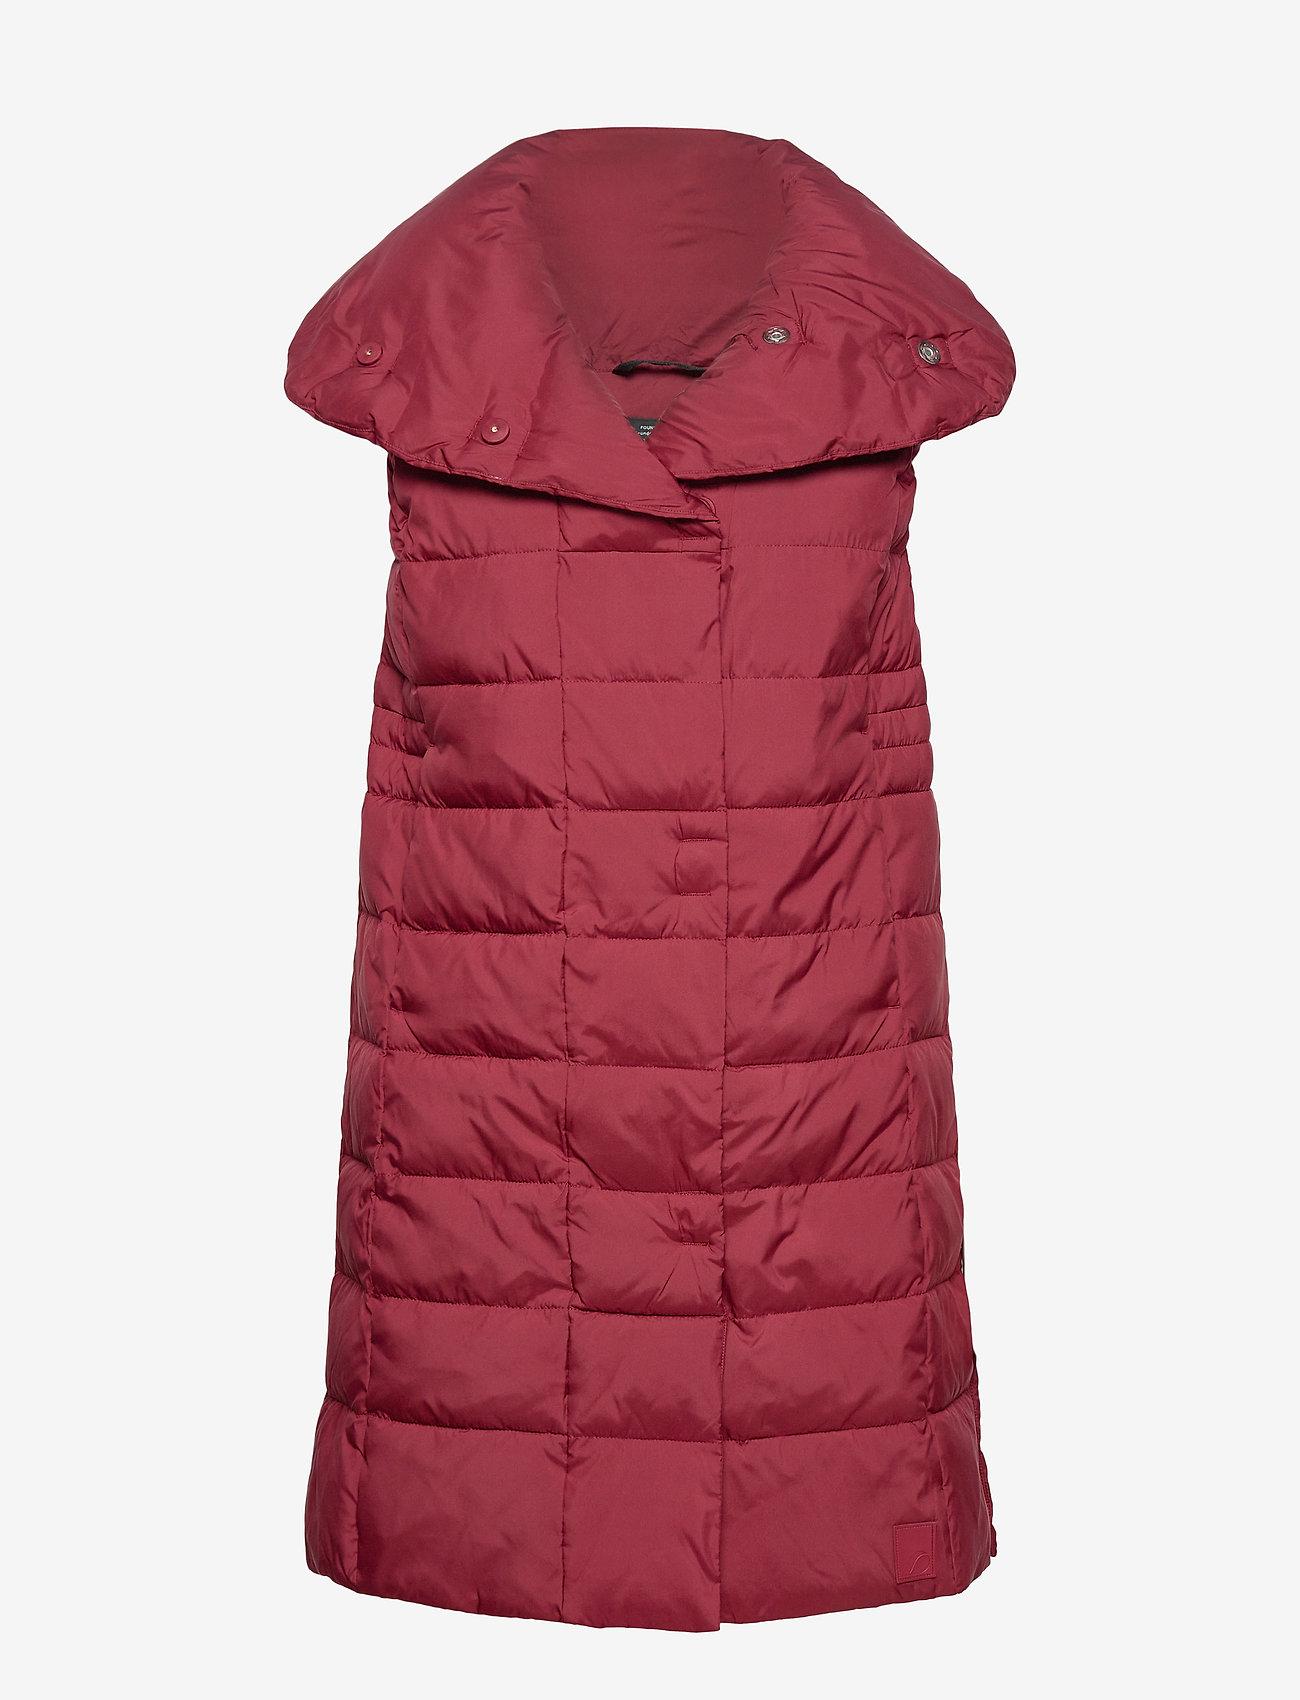 Didriksons - MY WNS VEST - puffer vests - velvet red - 1